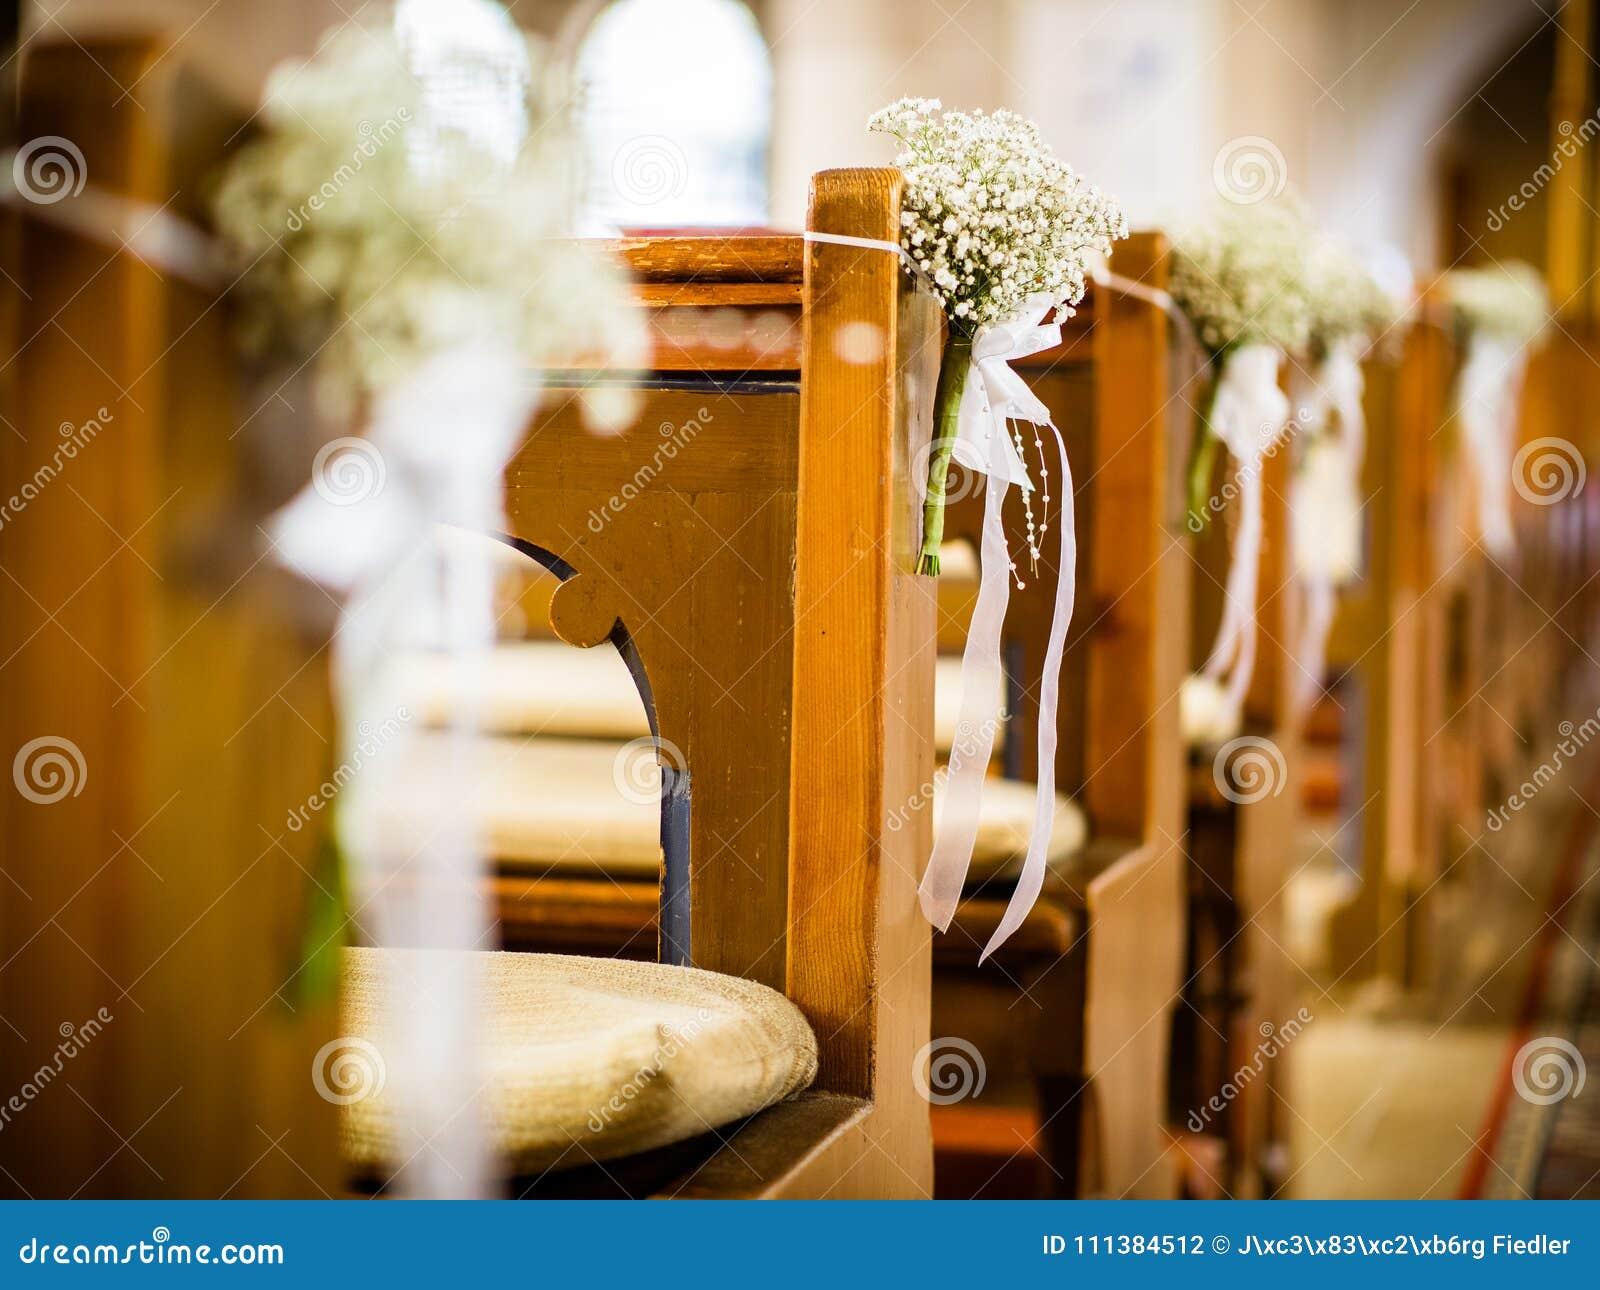 2 403 Wedding Church Design Photos Free Royalty Free Stock Photos From Dreamstime